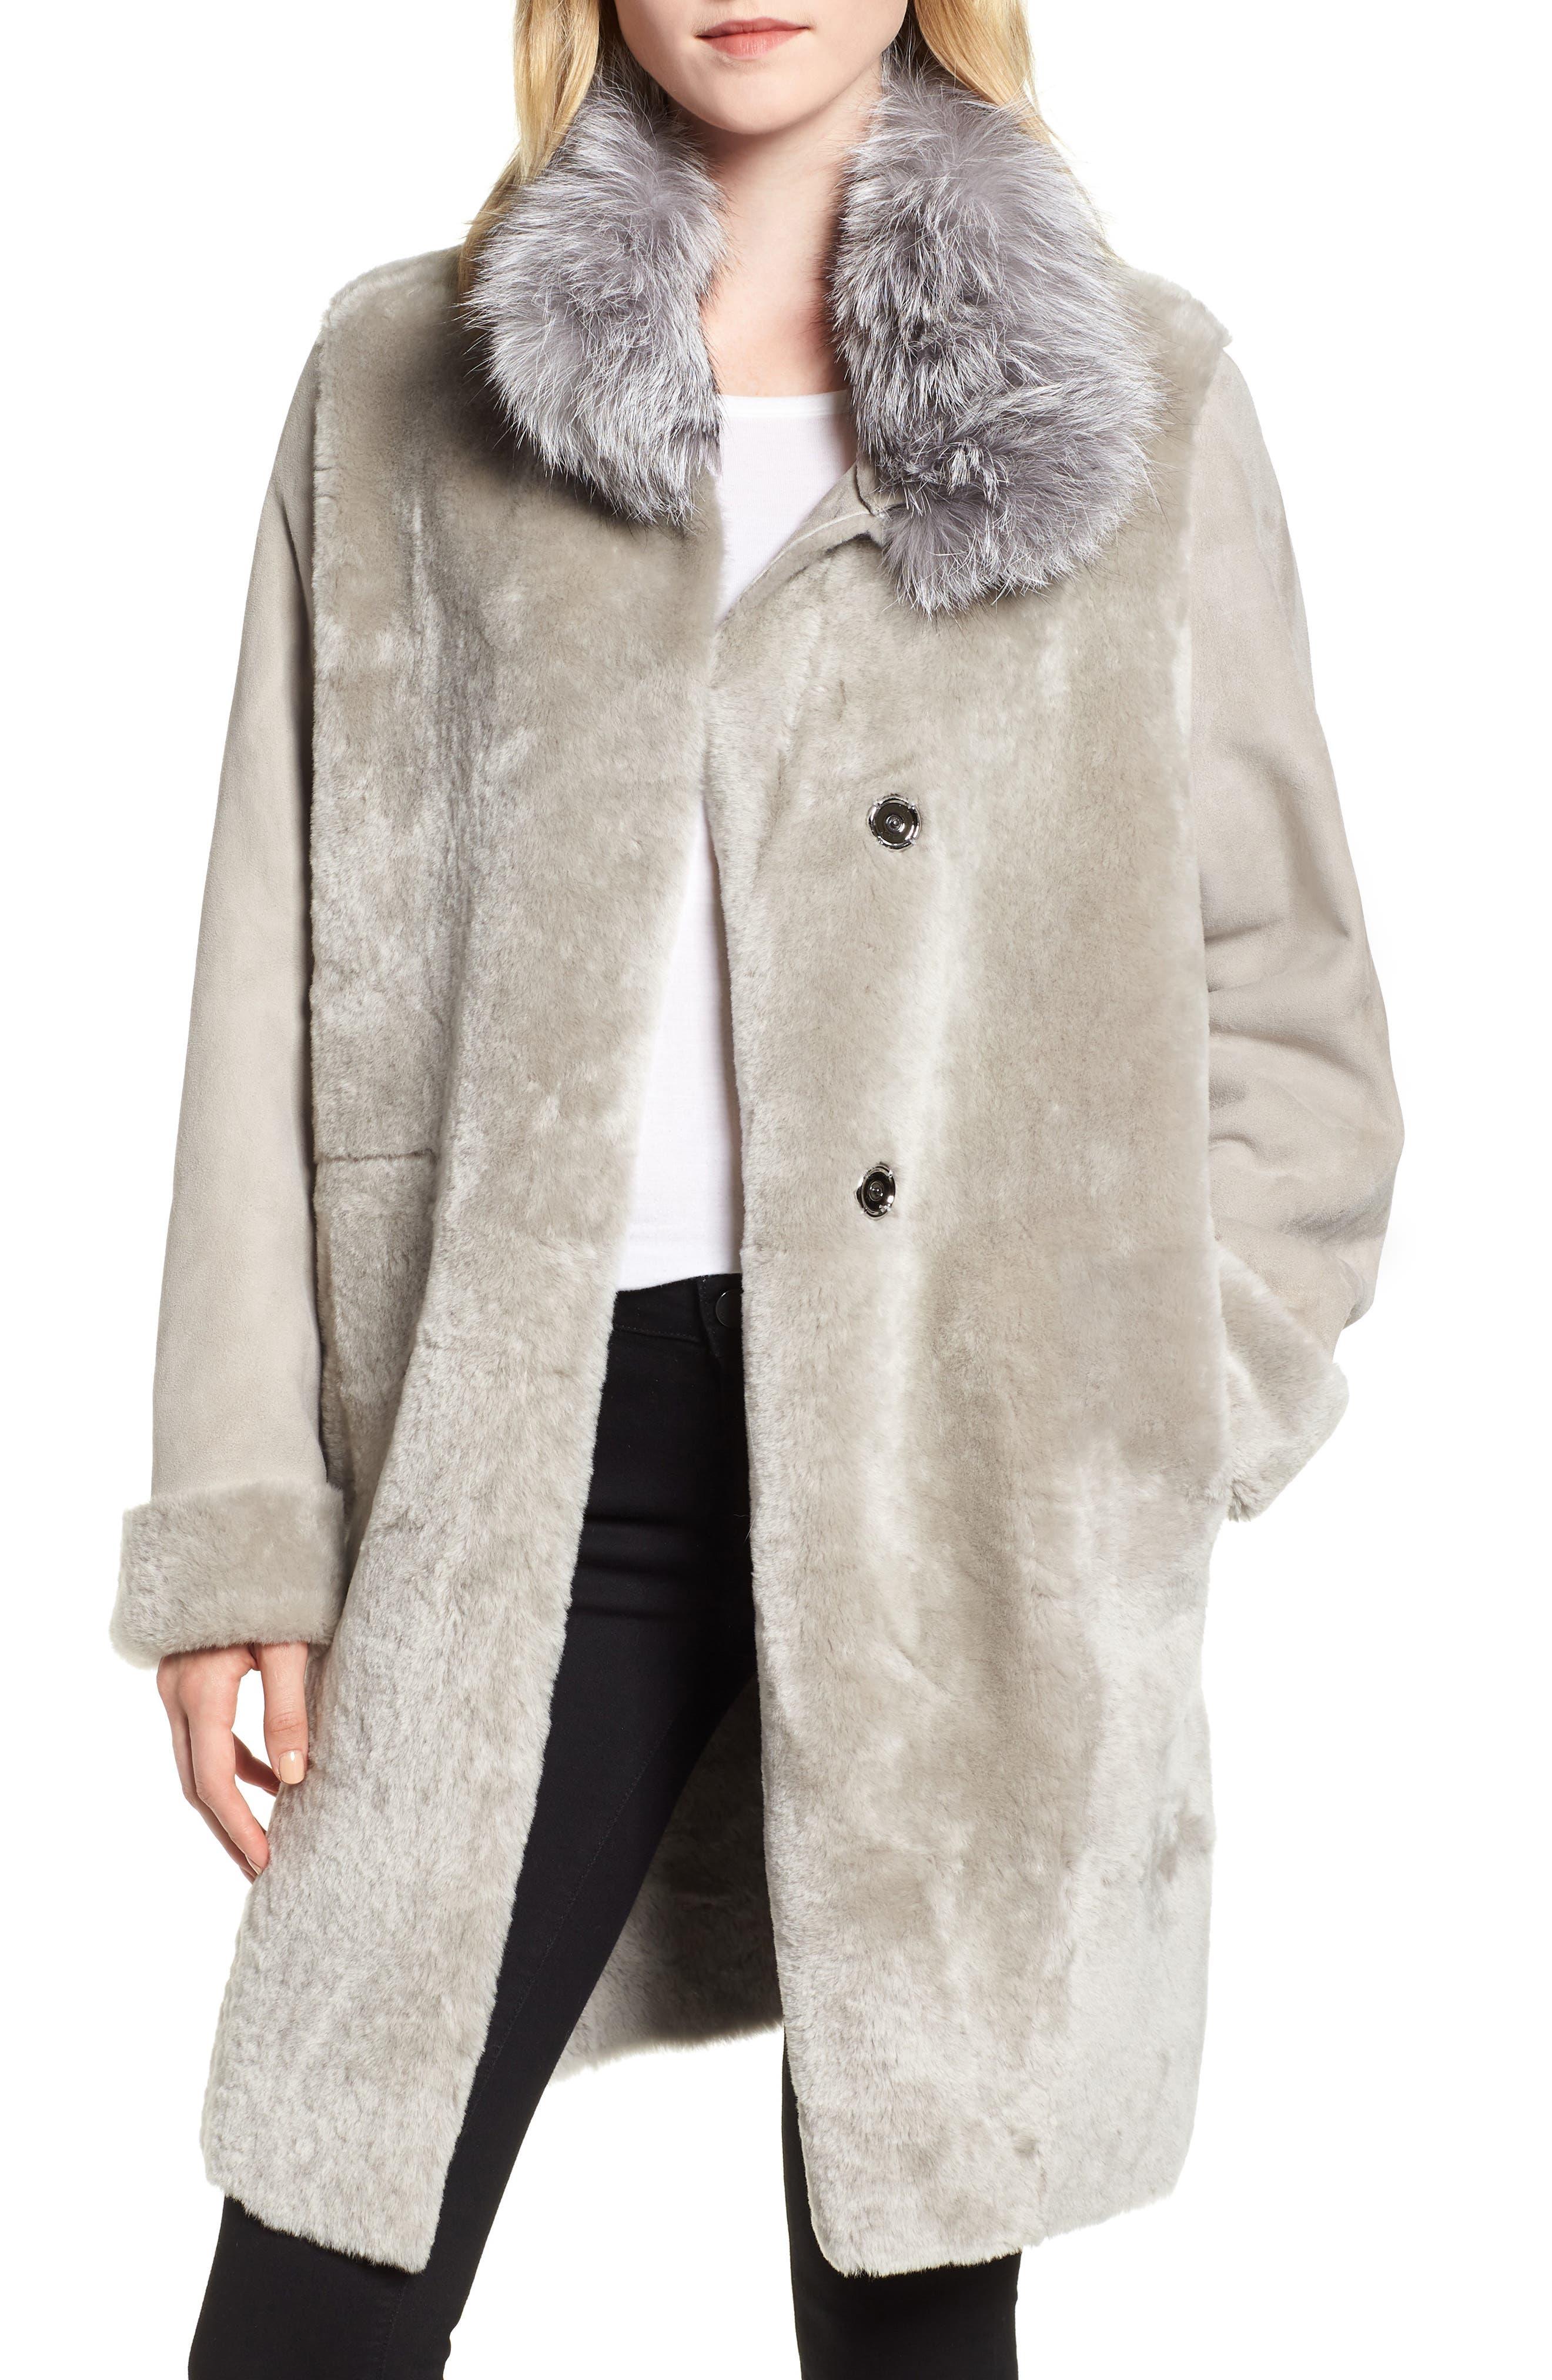 Hiso Lia Genuine Shearling Coat With Genuine Fox Fur, Grey